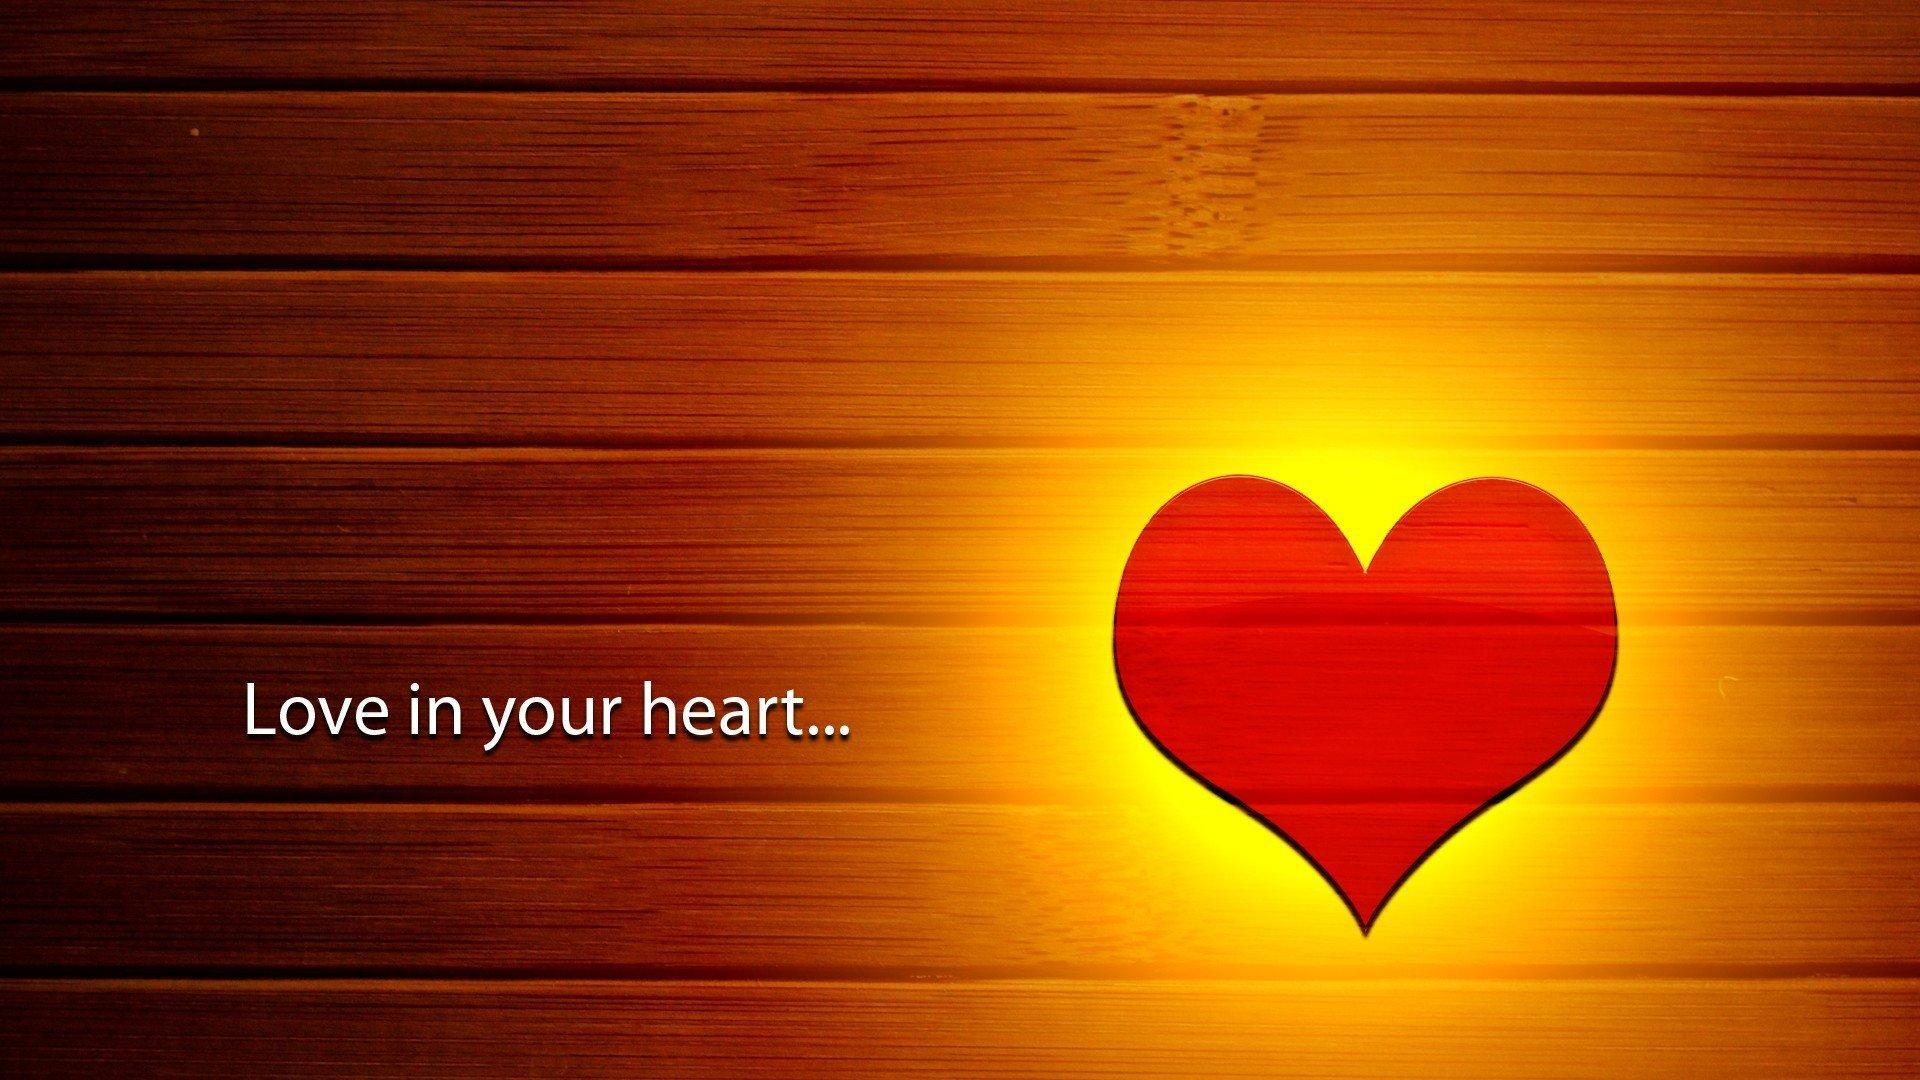 Heart In Love Wallpaper Hd: 唯美爱心文艺桌面壁纸大全 唯美爱心文艺桌面壁纸大全专辑下载-找素材网